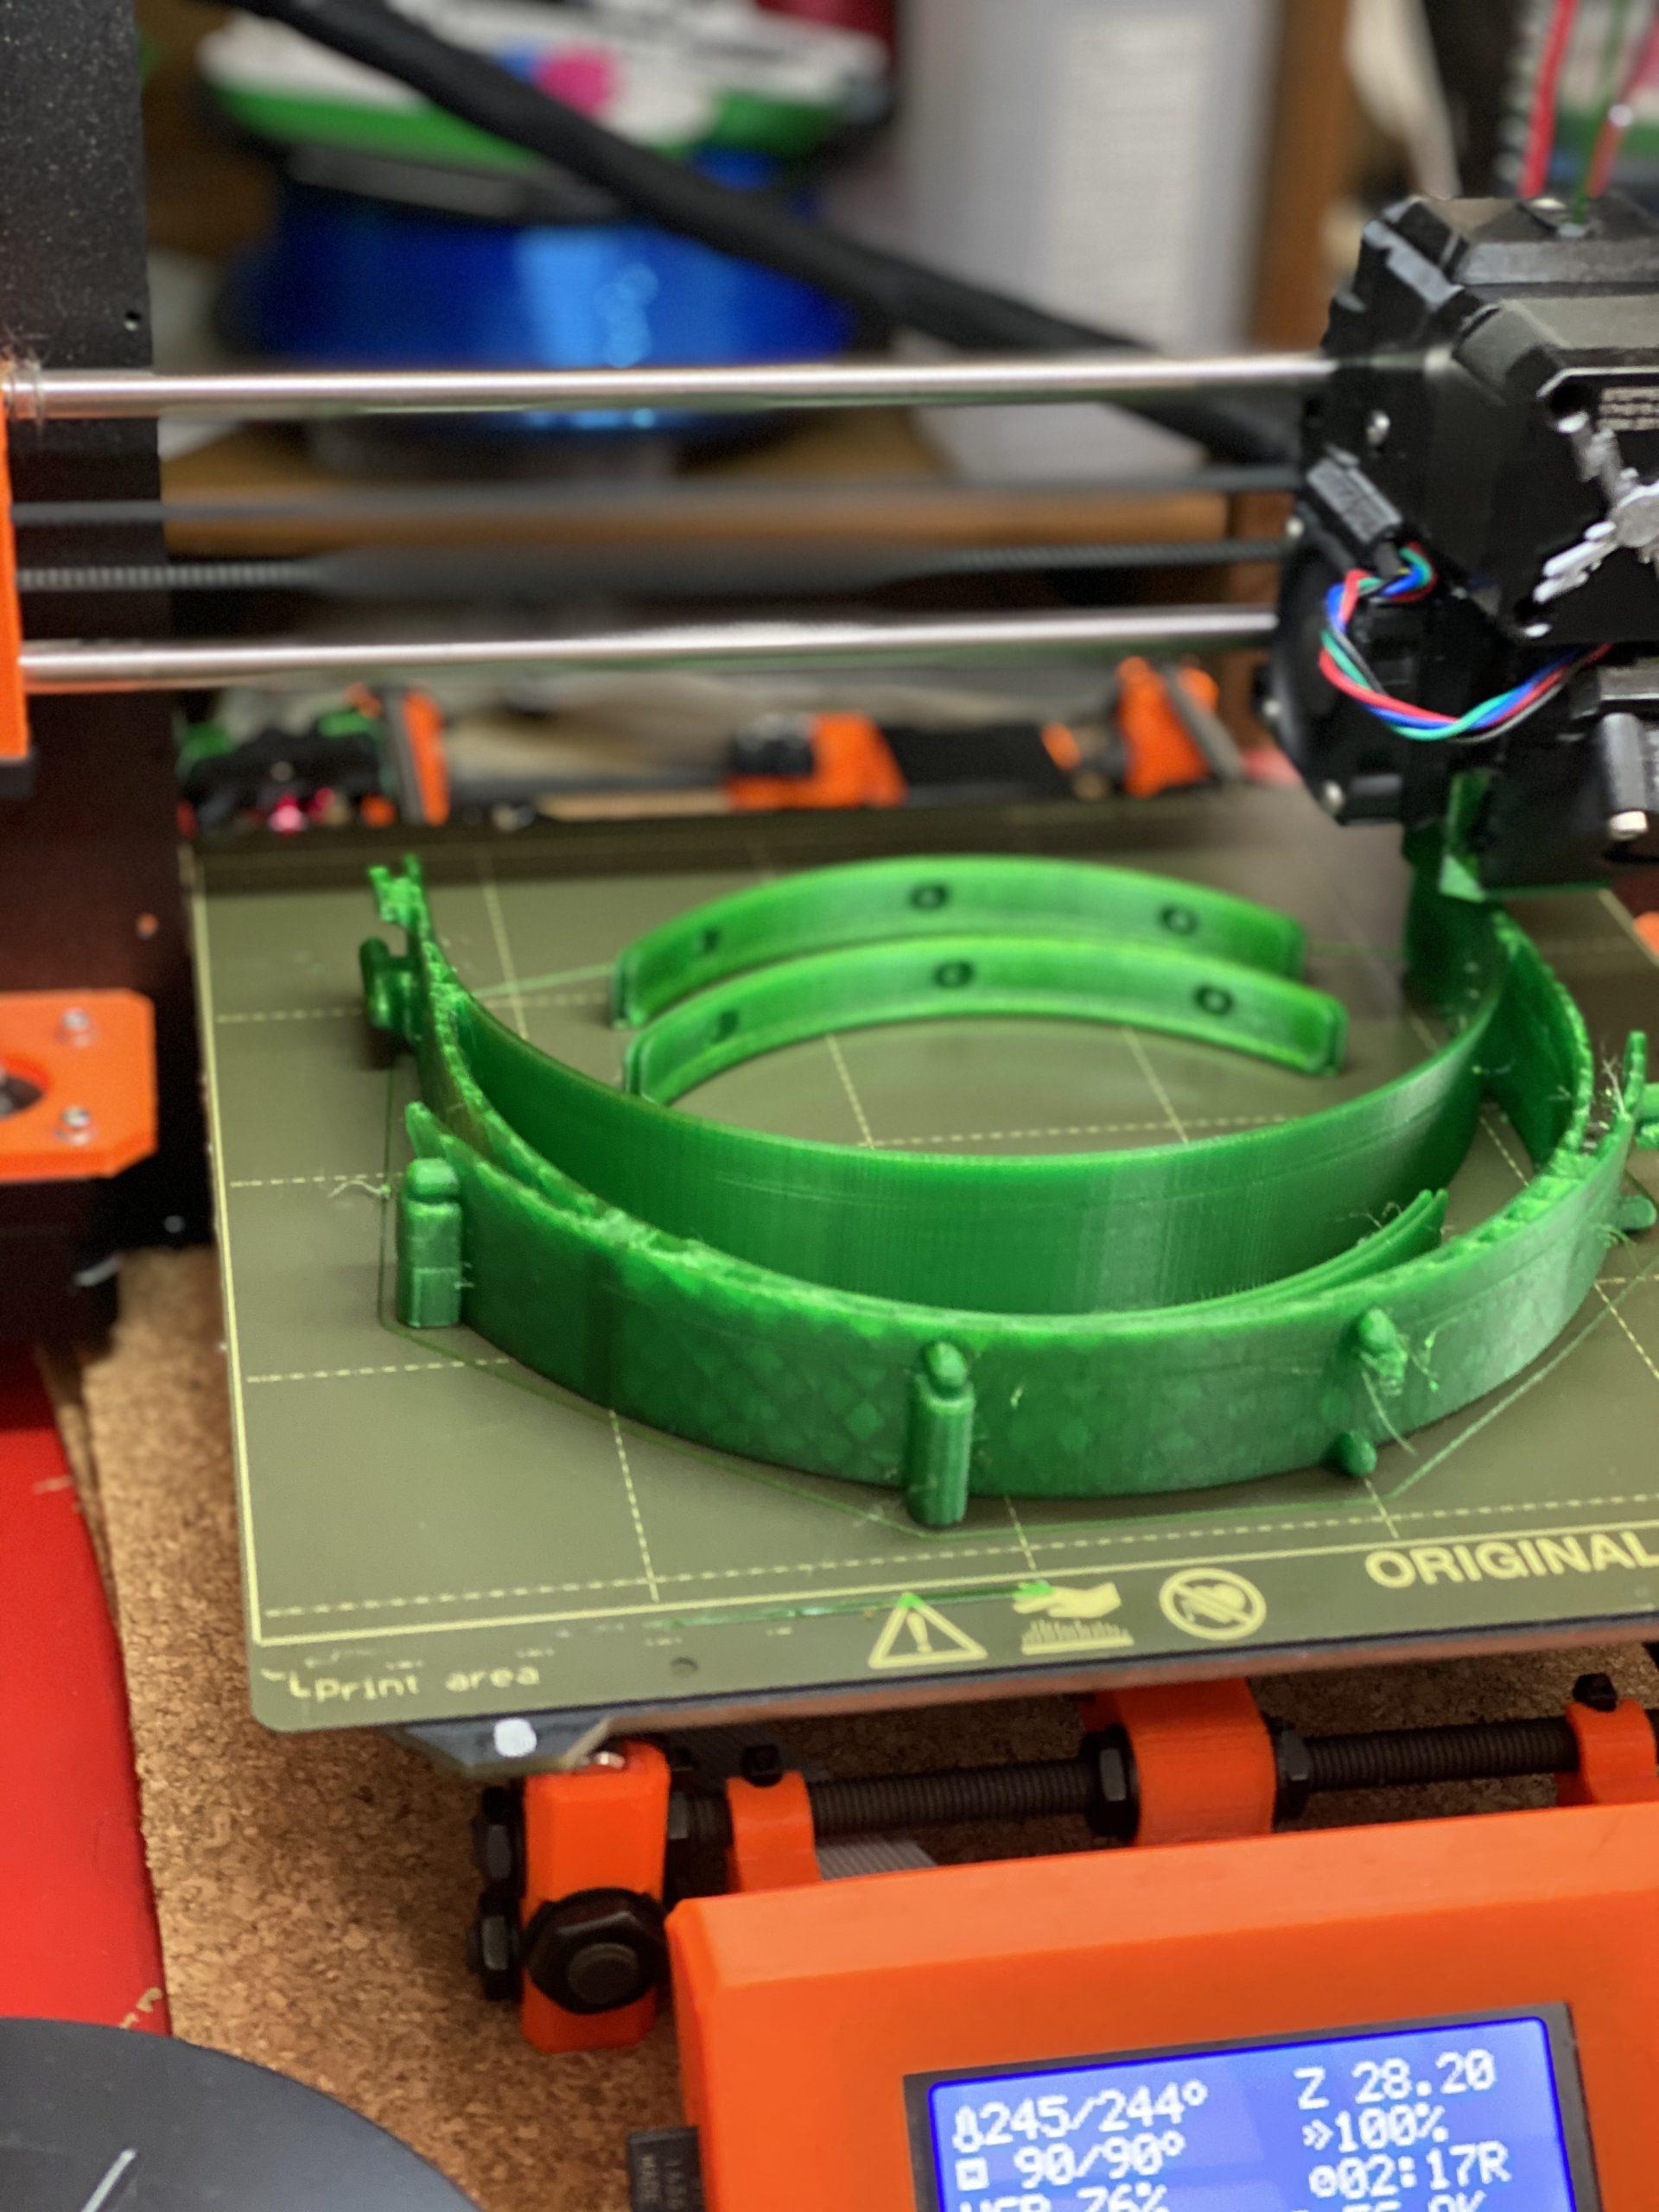 Prusa face shield 3D printer